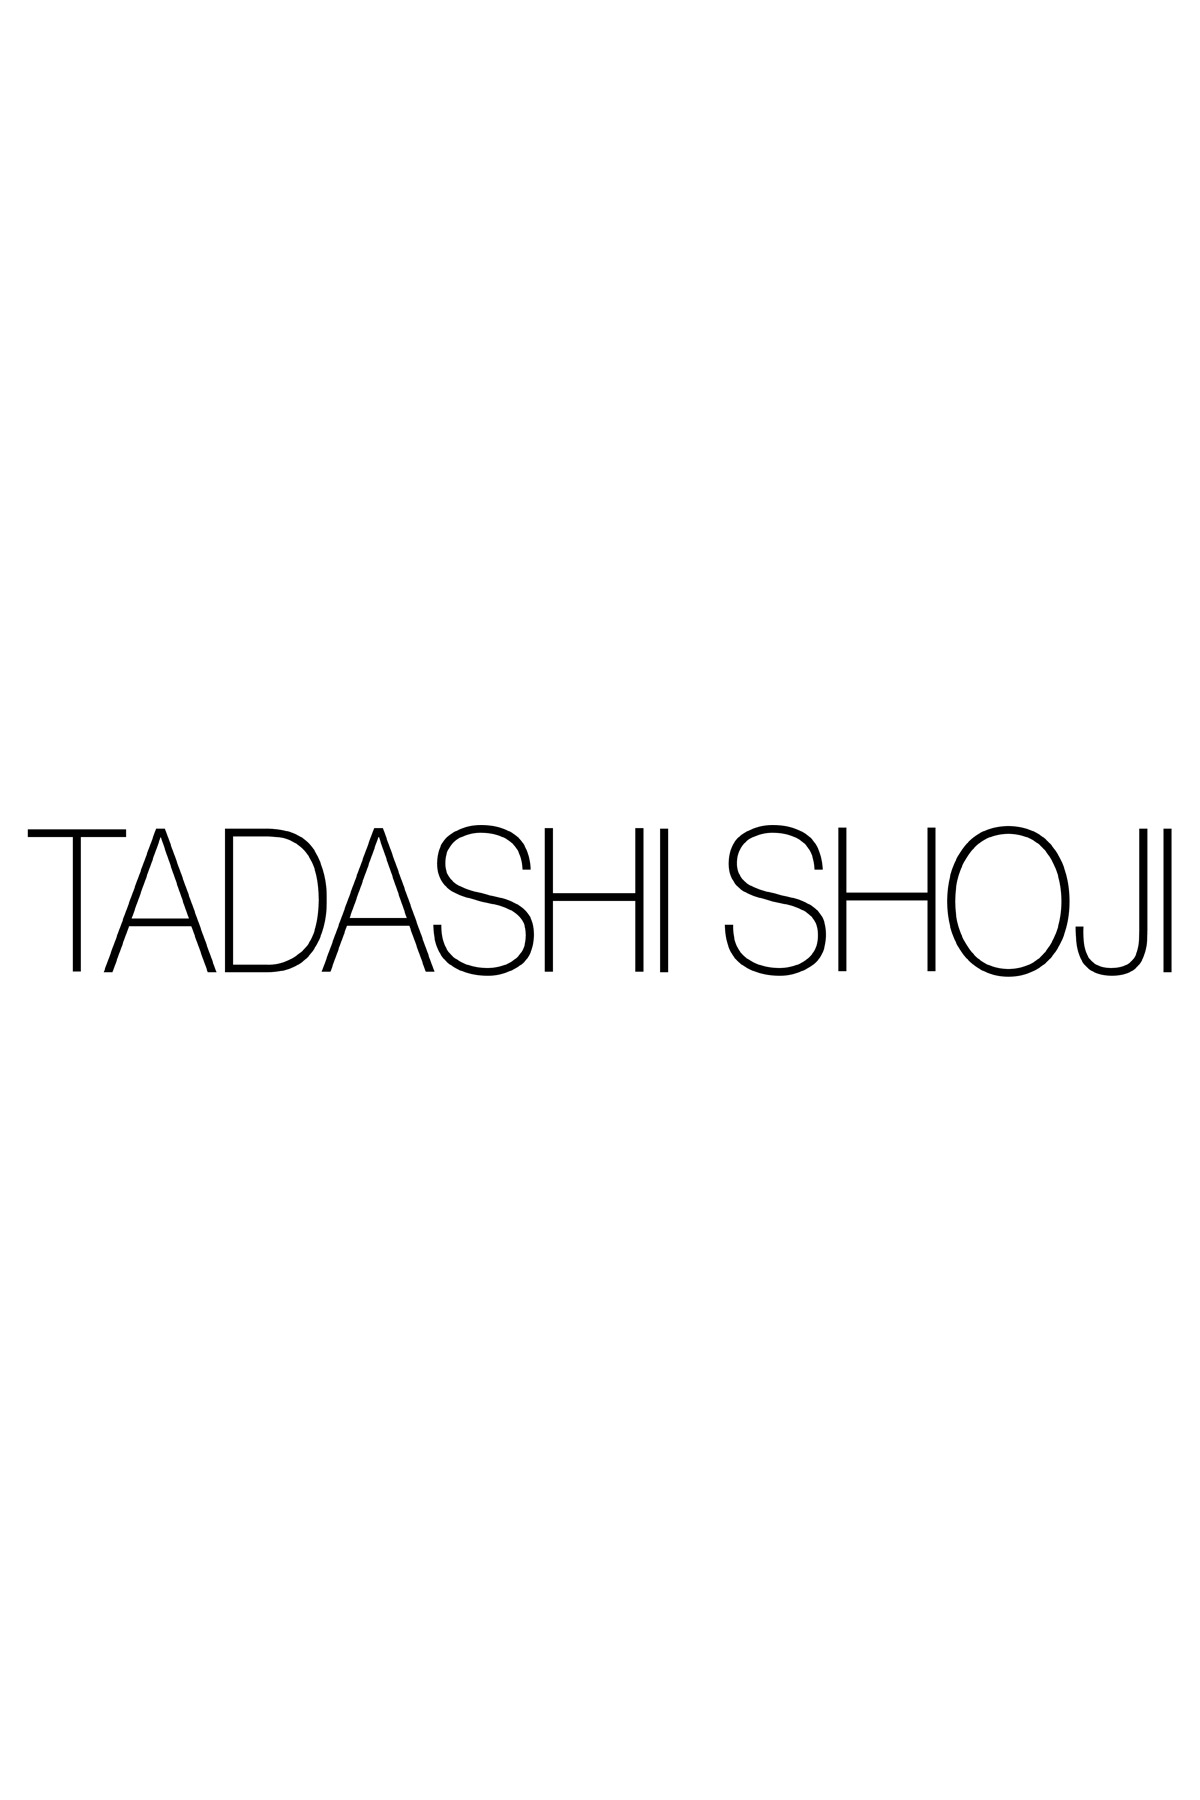 Tadashi Shoji Petite - Corded Embroidery on Tulle 3/4 Sleeve Dress